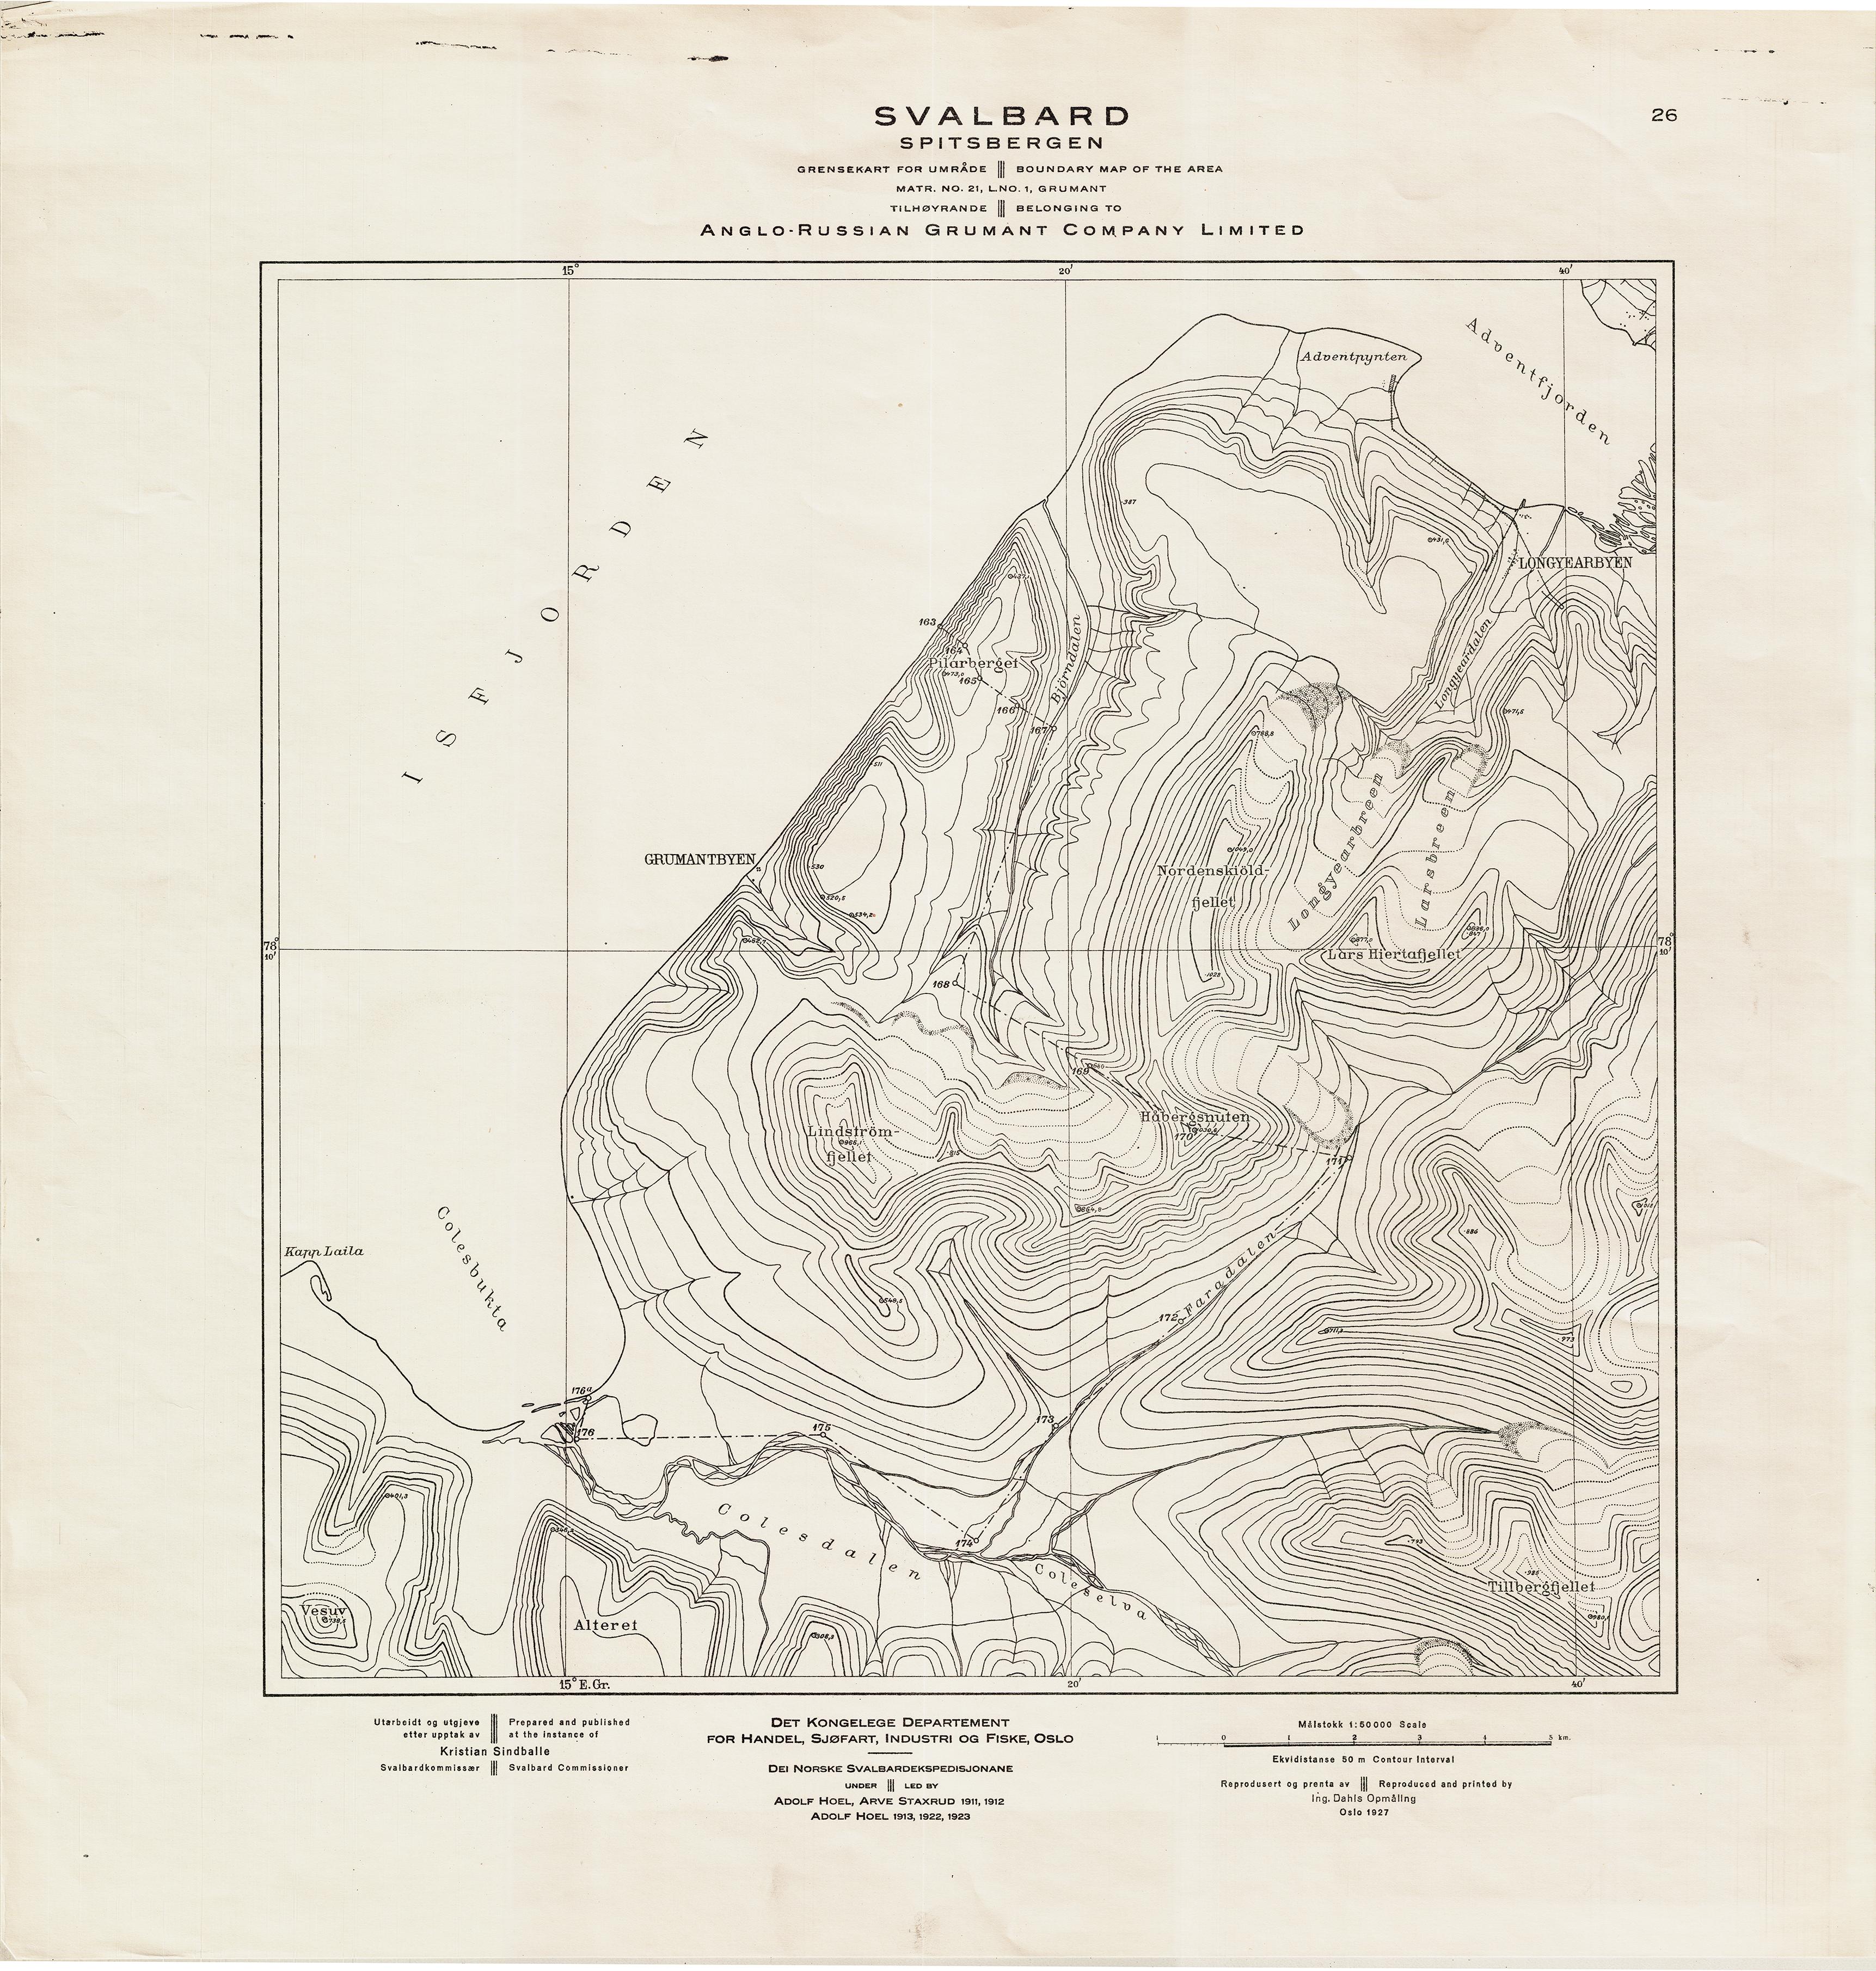 fiske kart File:Kart over Grumant, Svalbard 1927.png   Wikimedia Commons fiske kart